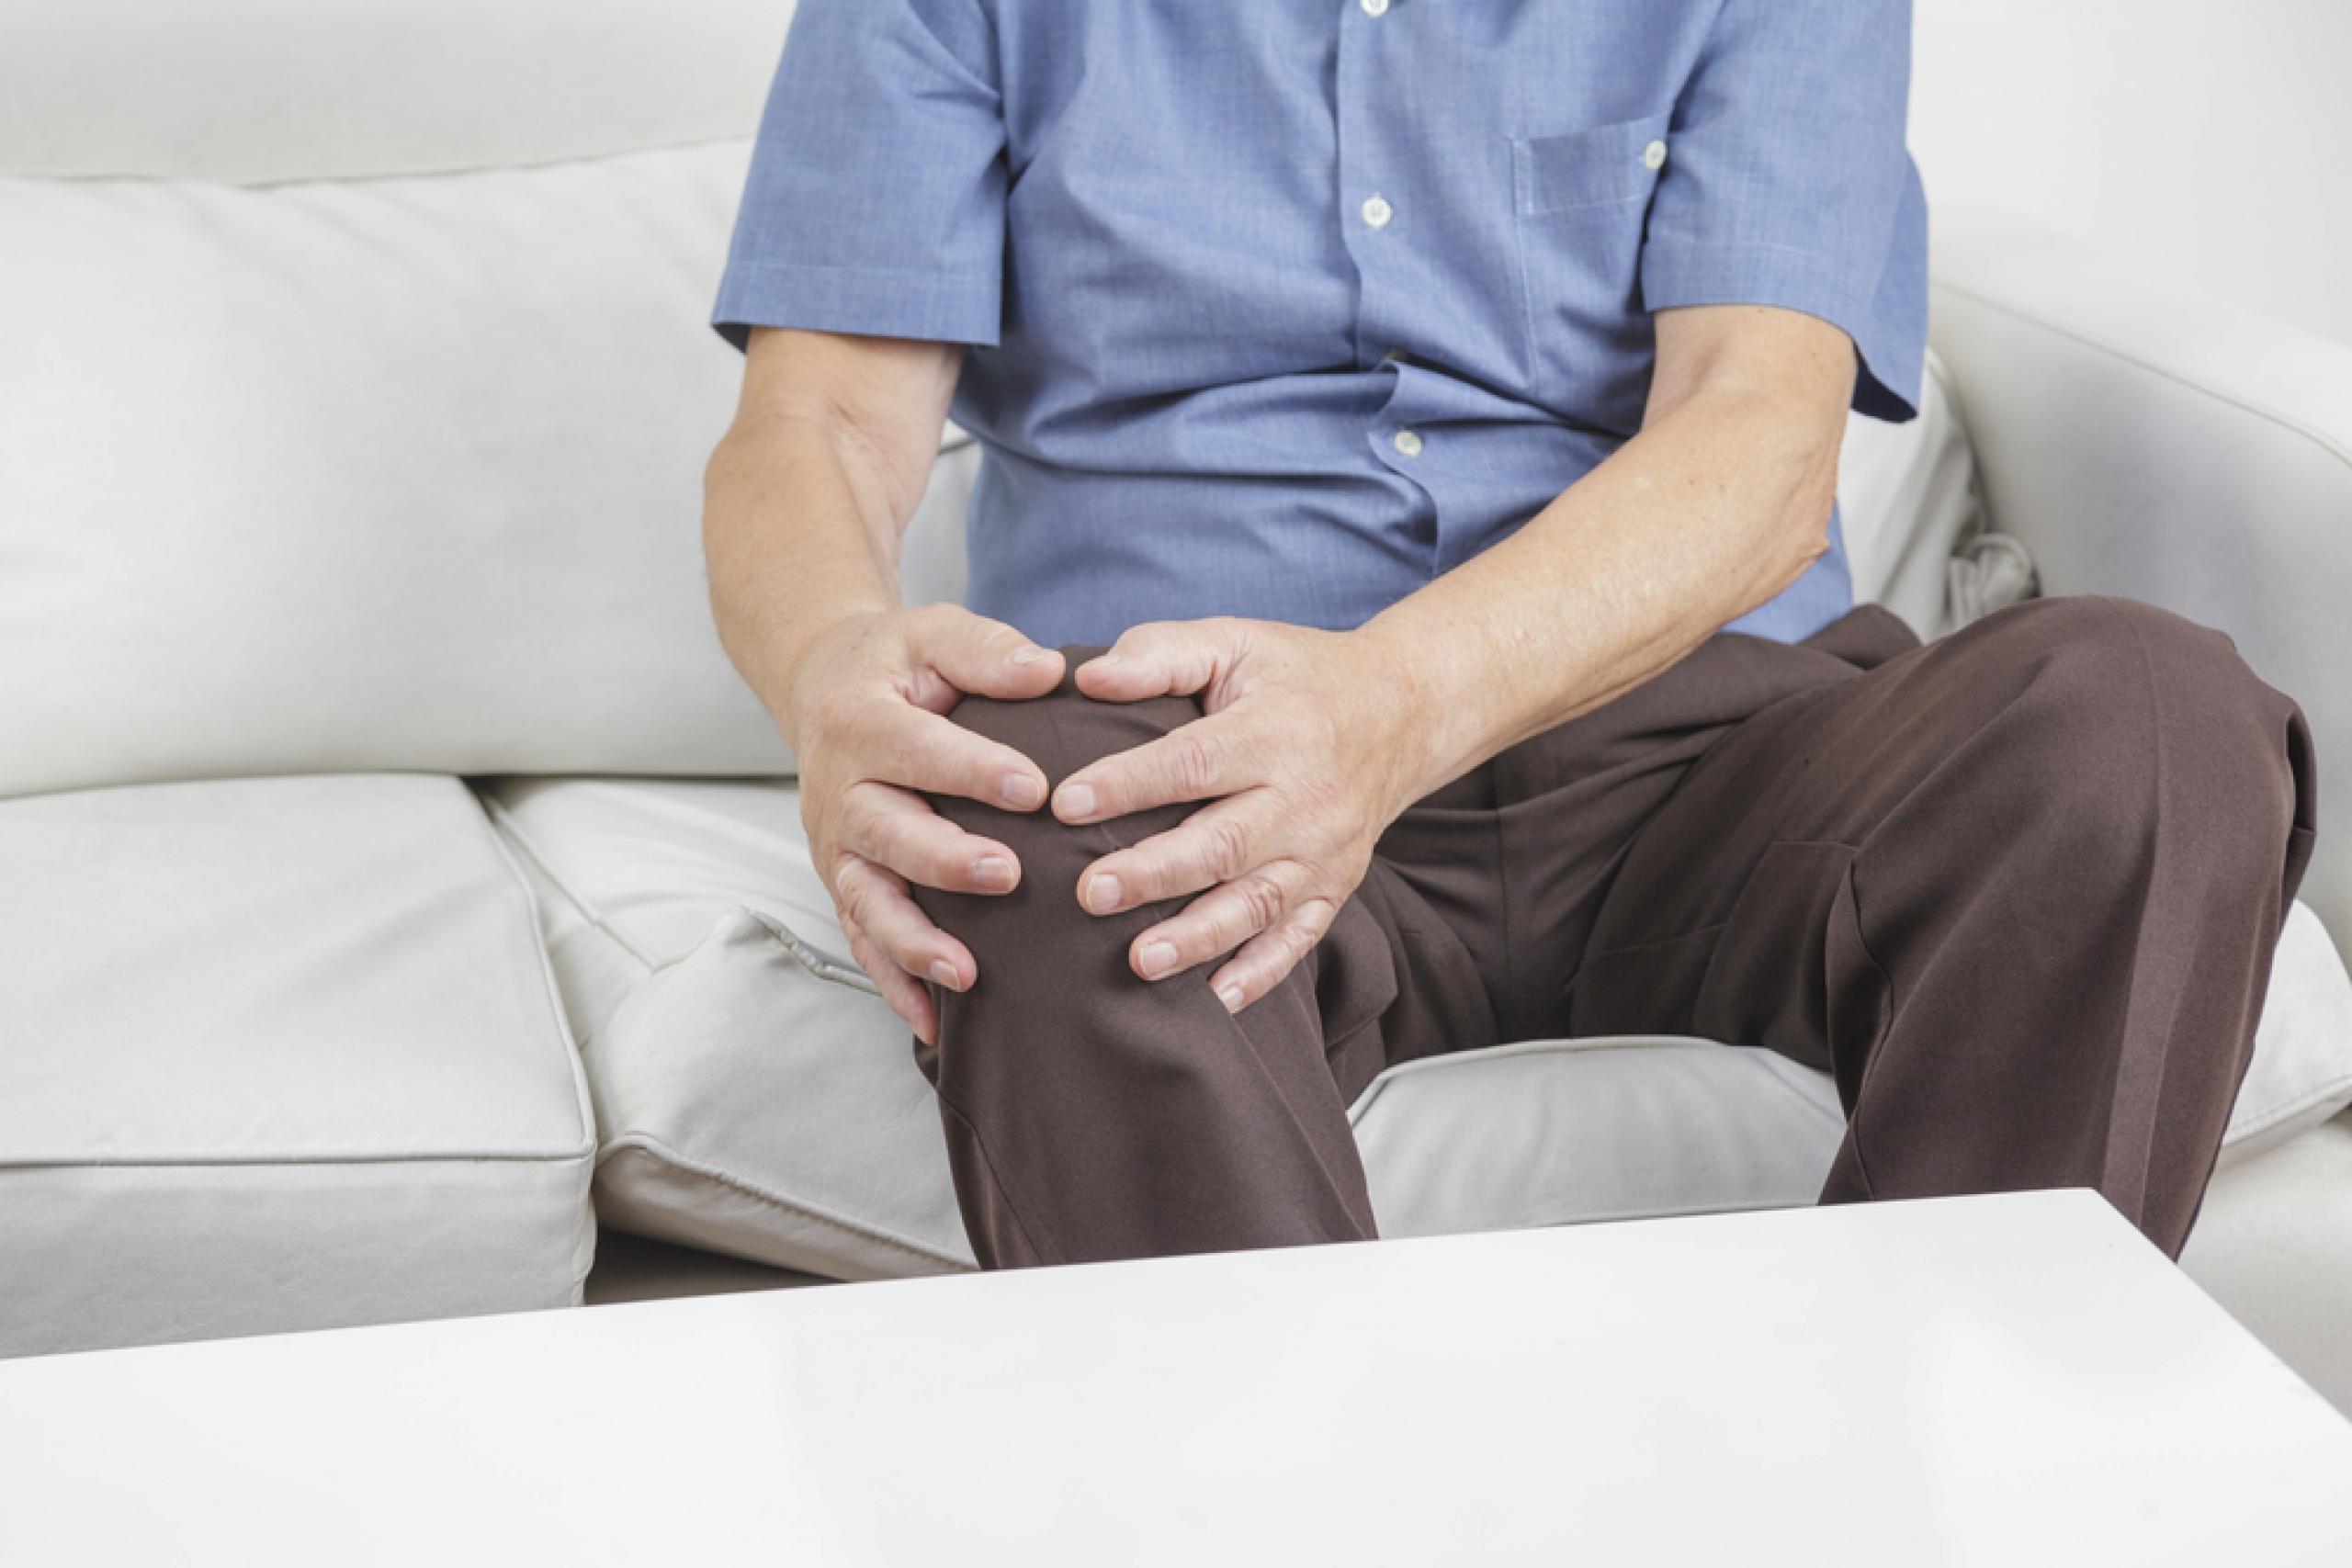 gyakorlatok kezek ízületi fájdalom